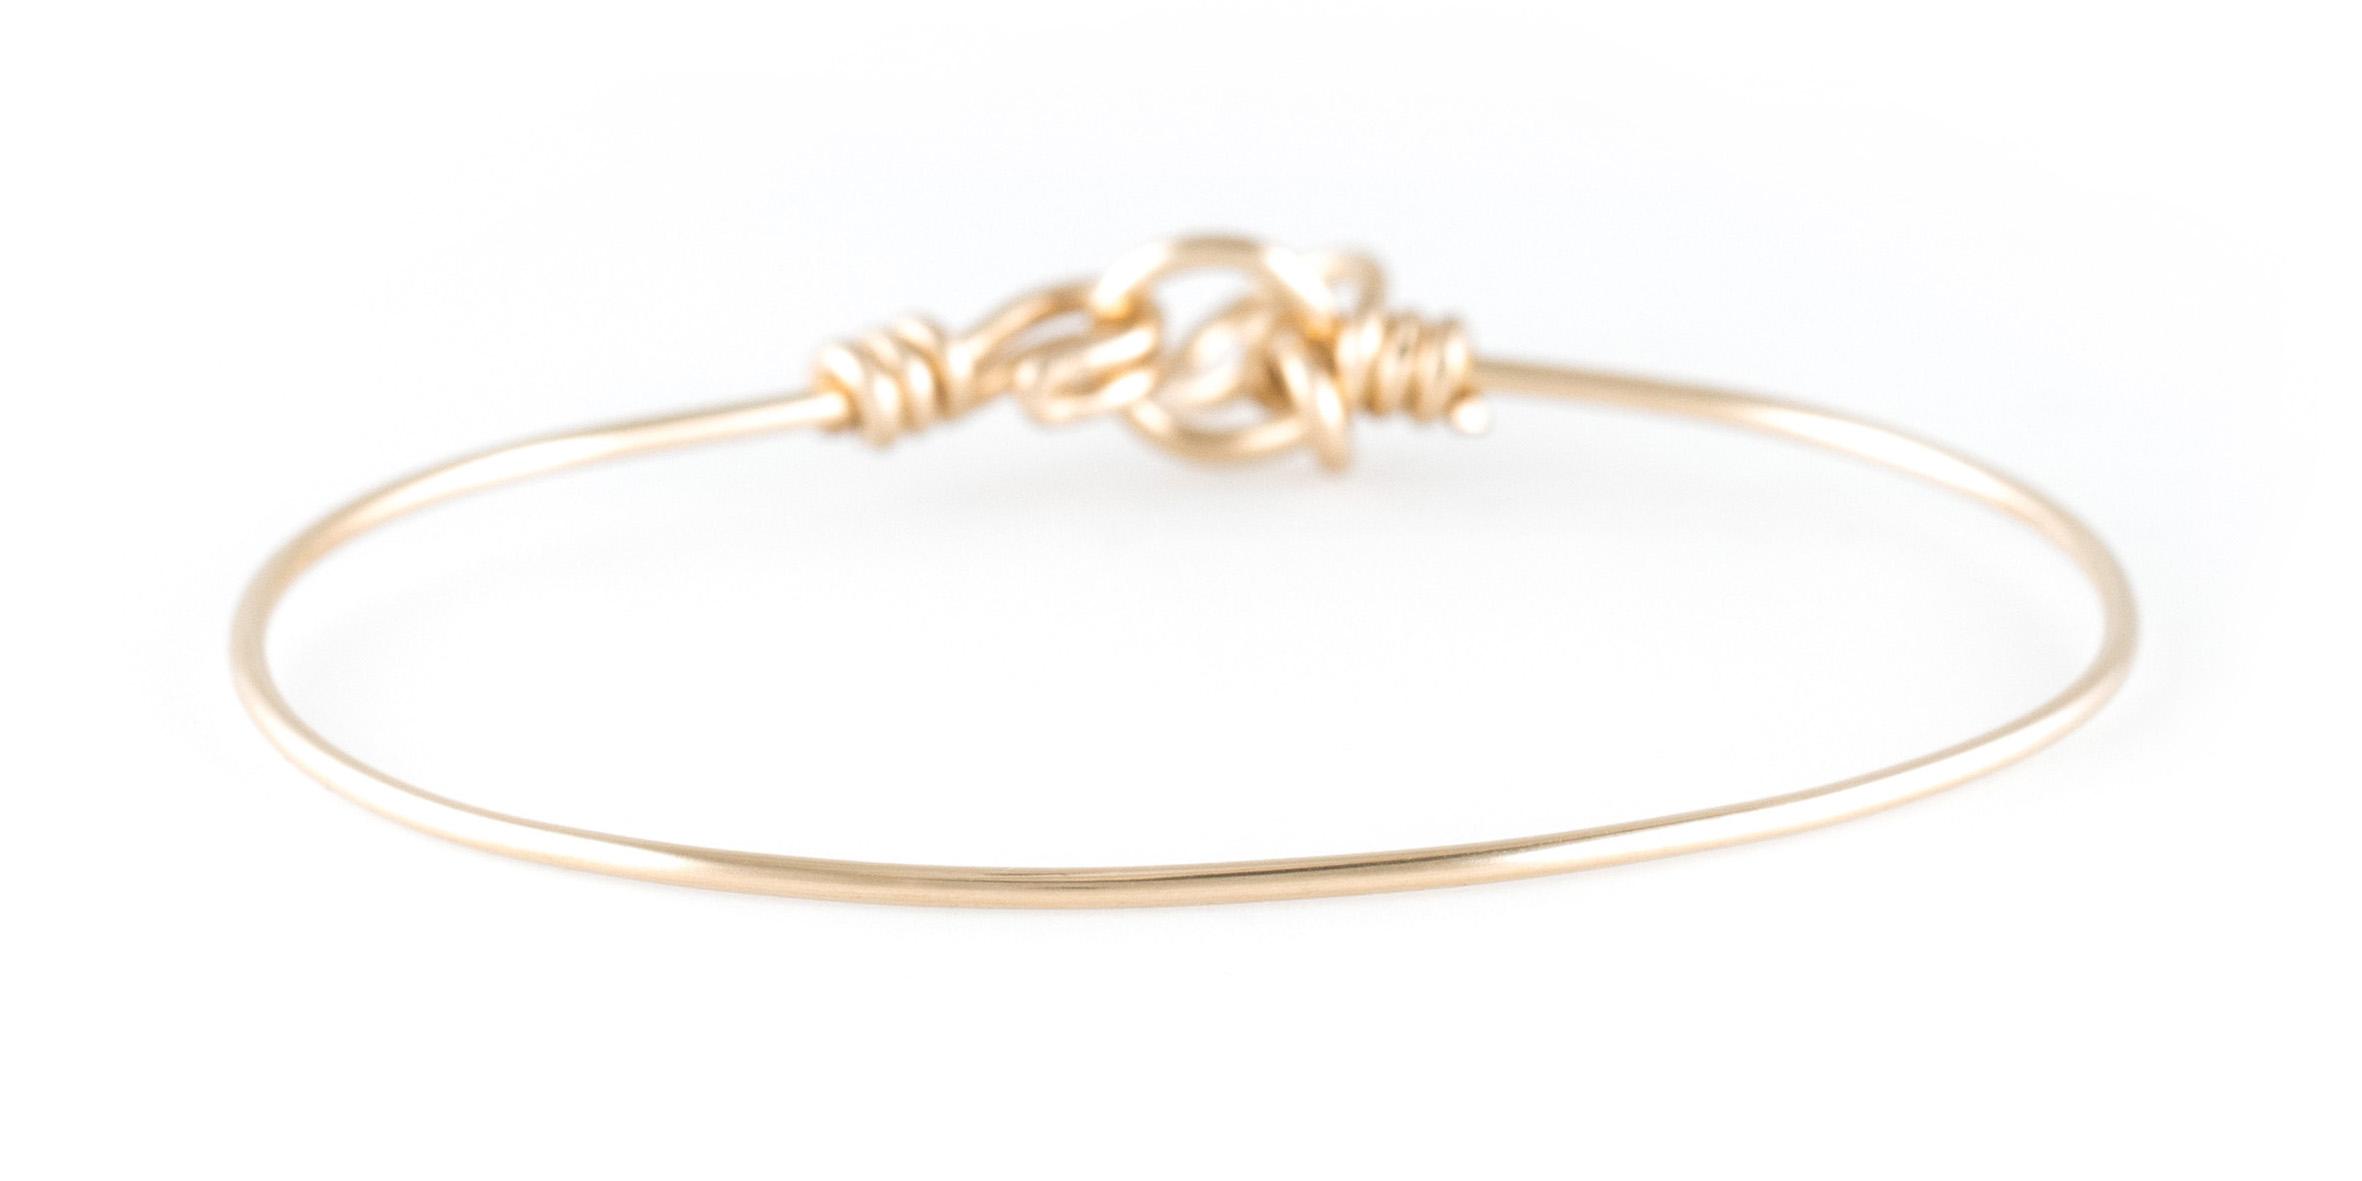 Bracelet Nude Pure en fil gold filled 14 cts jaune 110€ Atelier Paulin